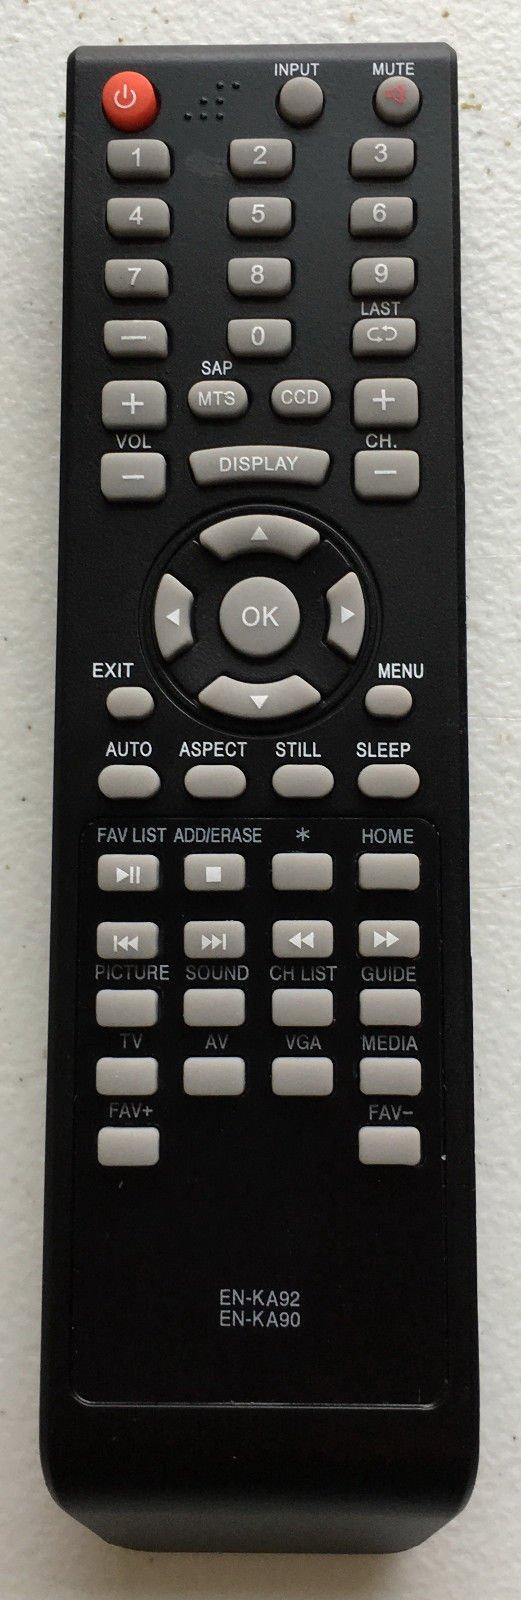 Cheap Hisense Tv Remote Codes, find Hisense Tv Remote Codes